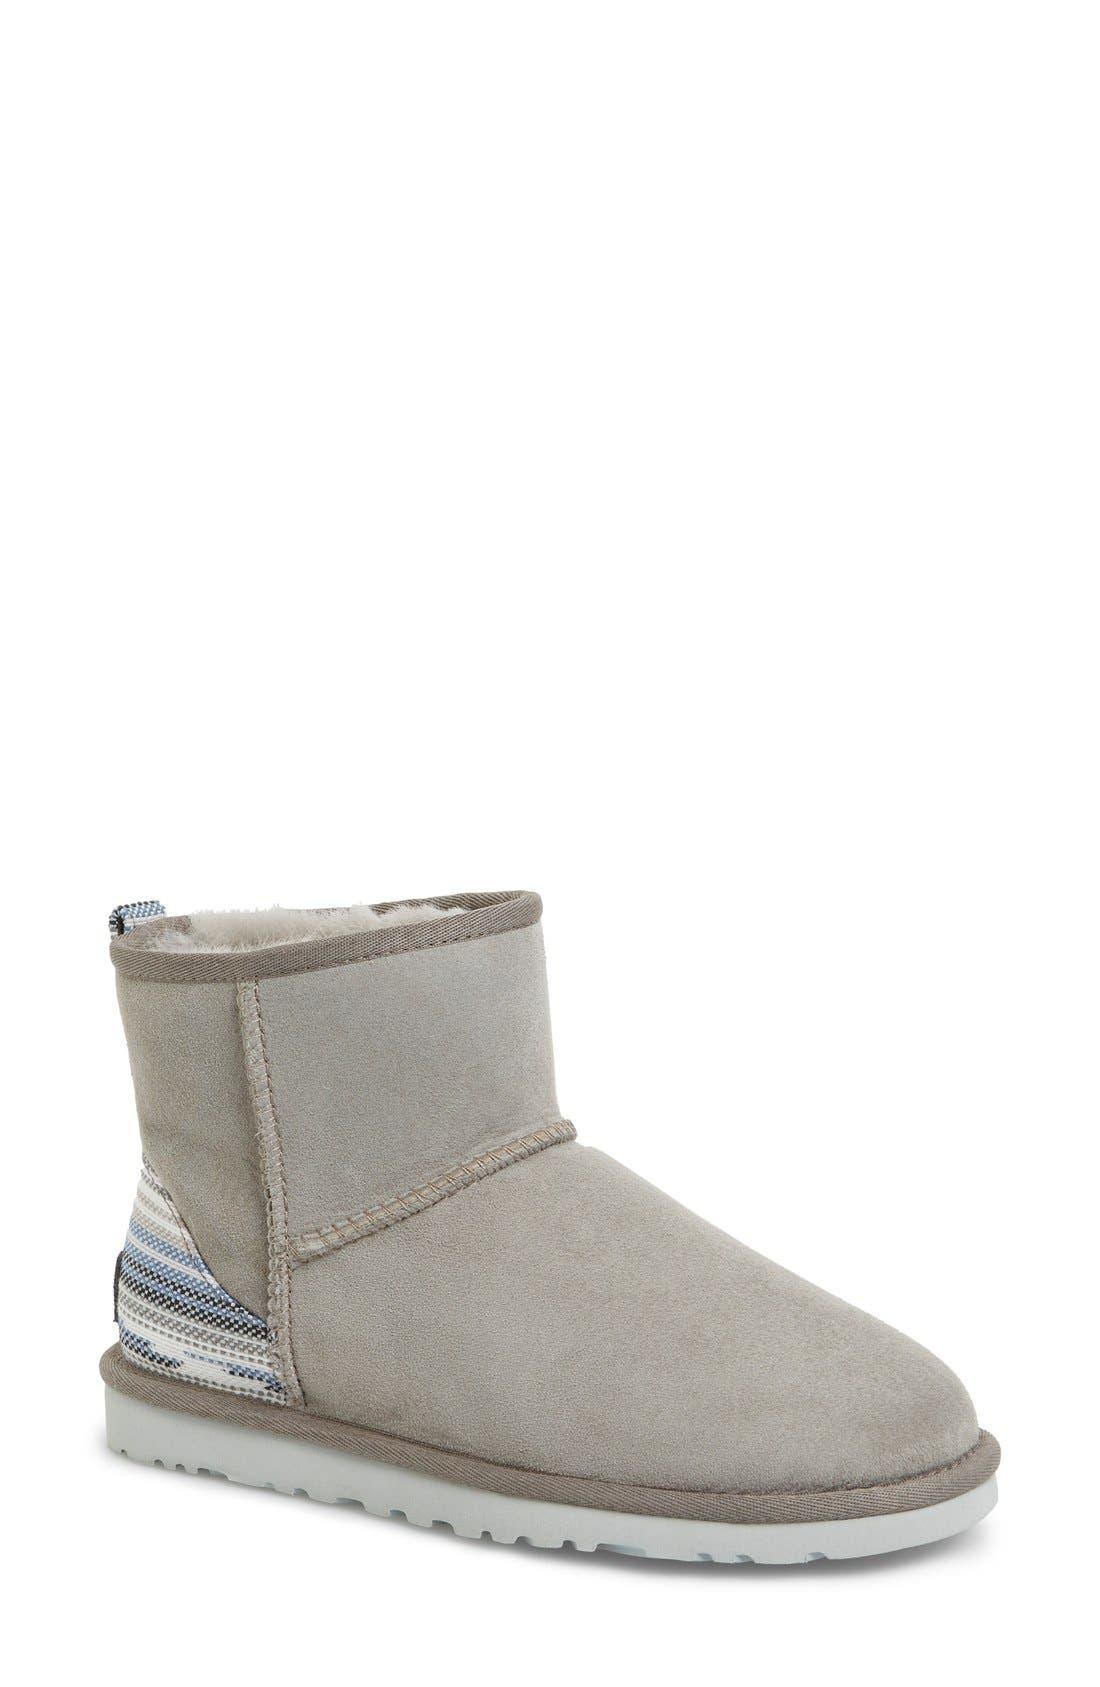 'Classic Mini Serape' Genuine Shearling Lined Boot,                             Main thumbnail 1, color,                             024